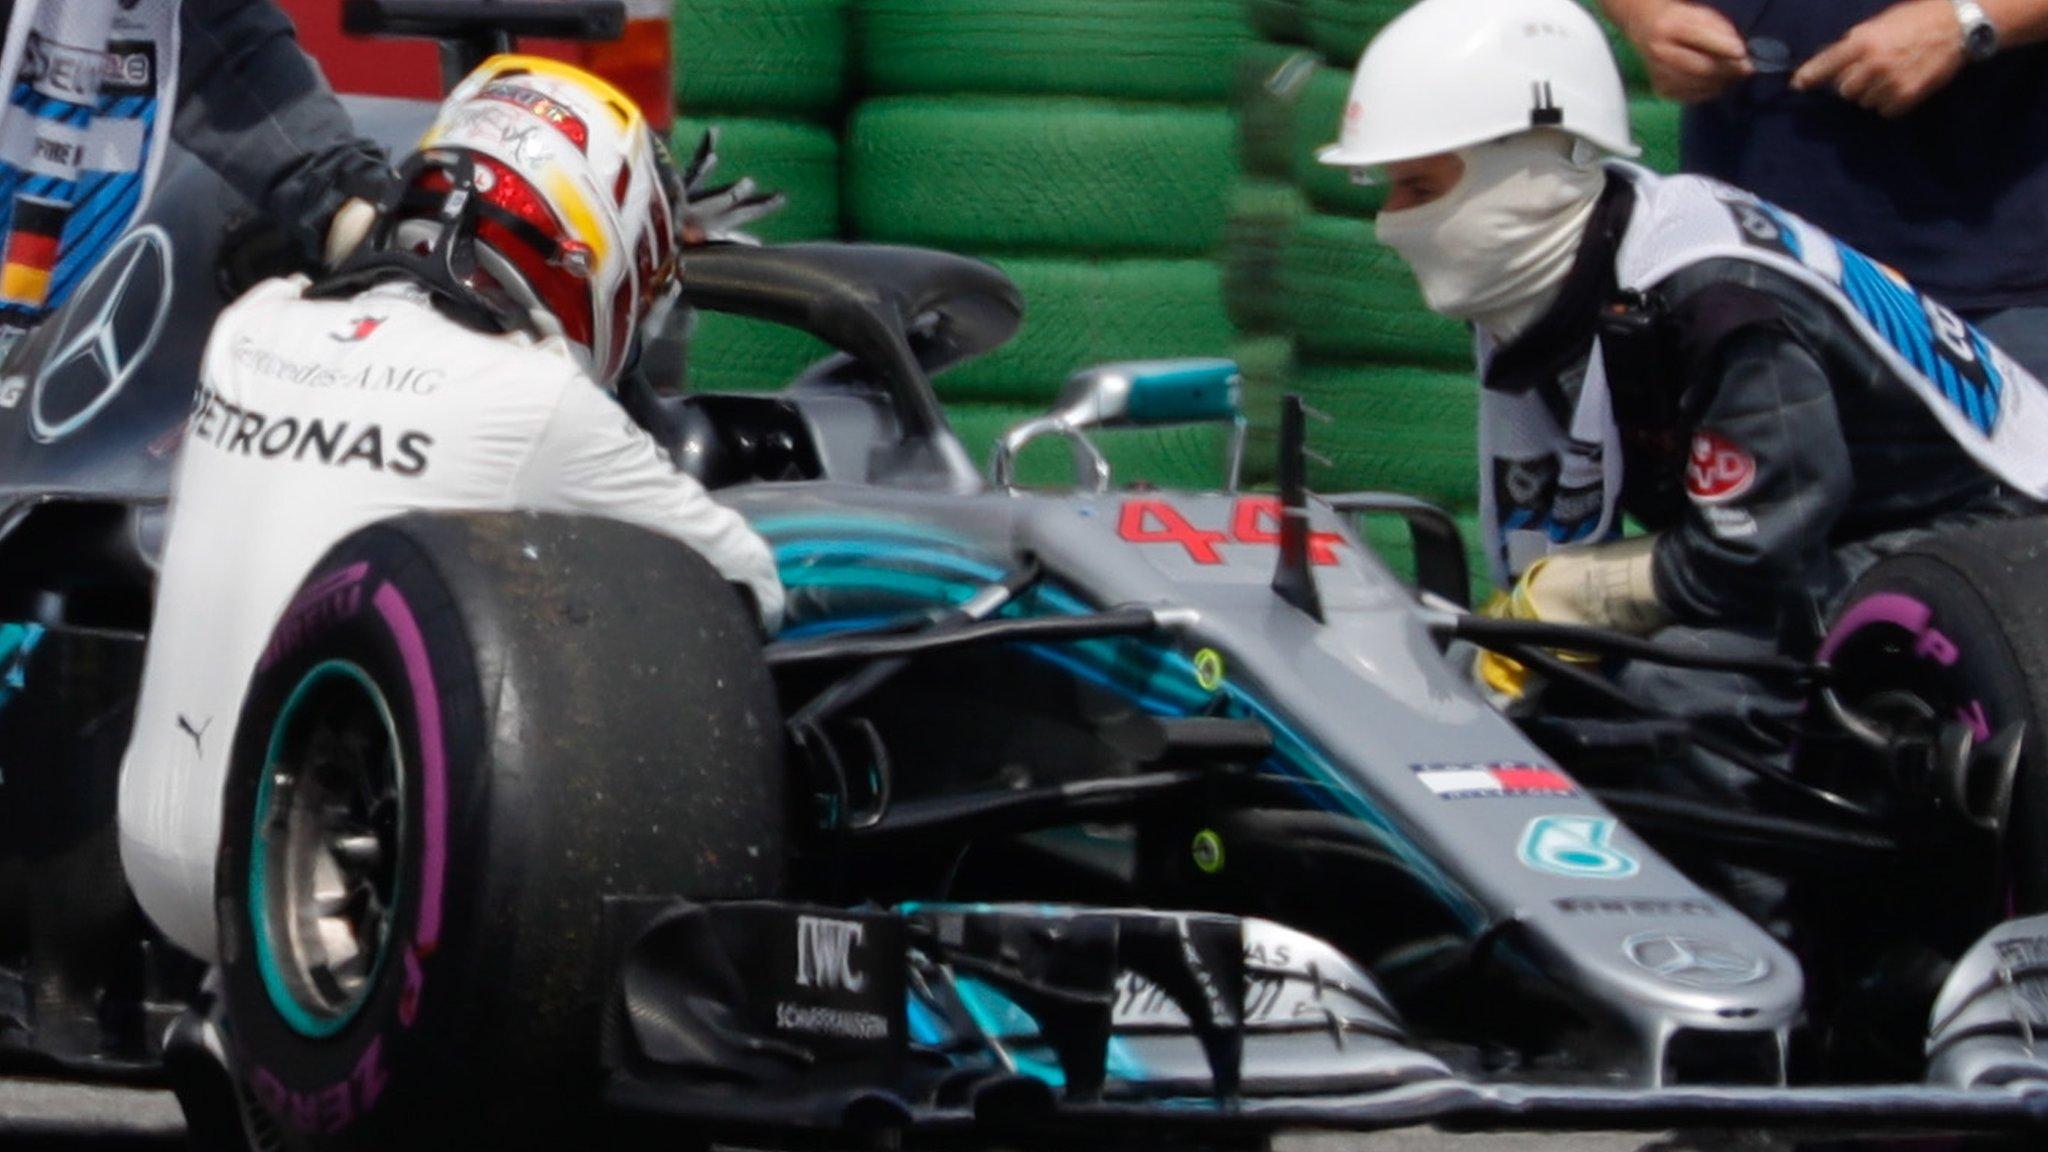 German GP: Sebastian Vettel on pole as Lewis Hamilton suffers hydraulic failure